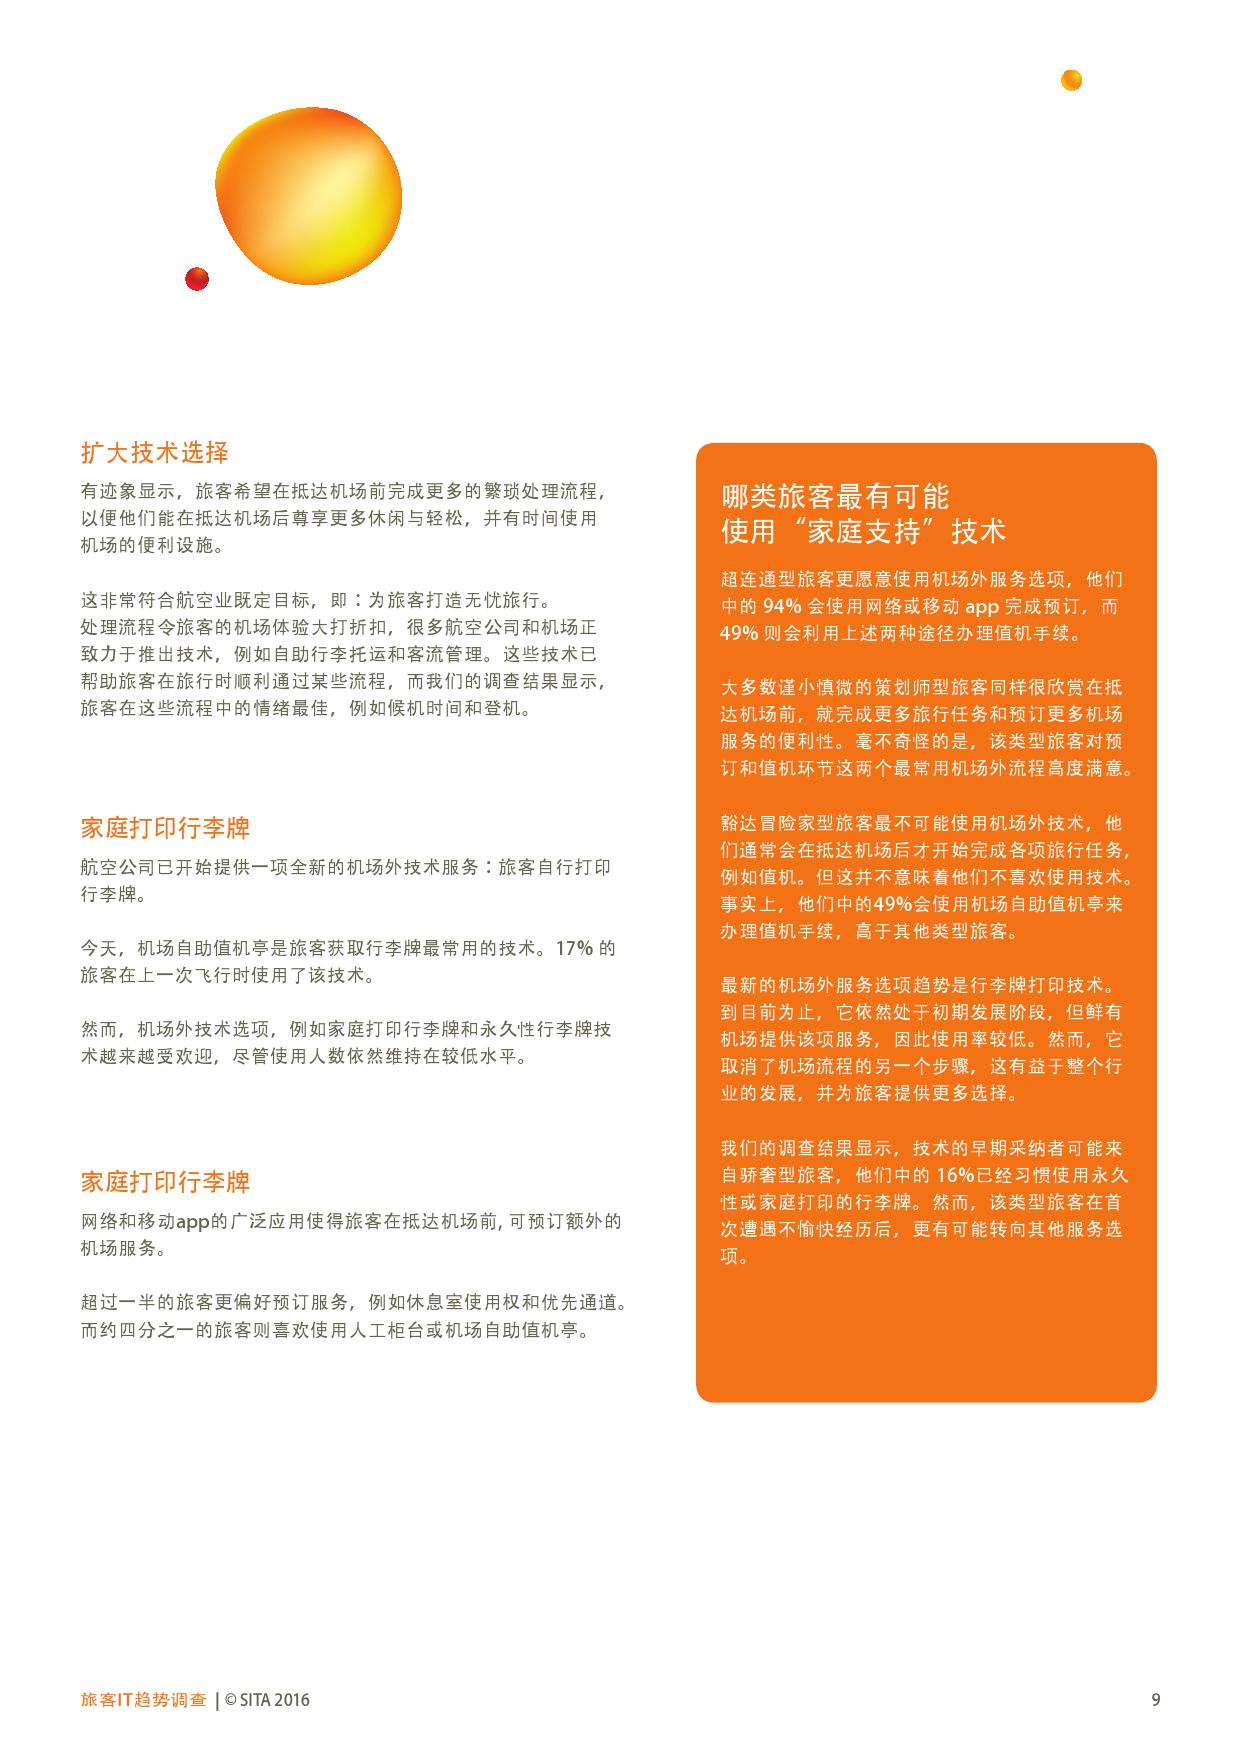 SITA:2016年中国旅客IT趋势调查_000008